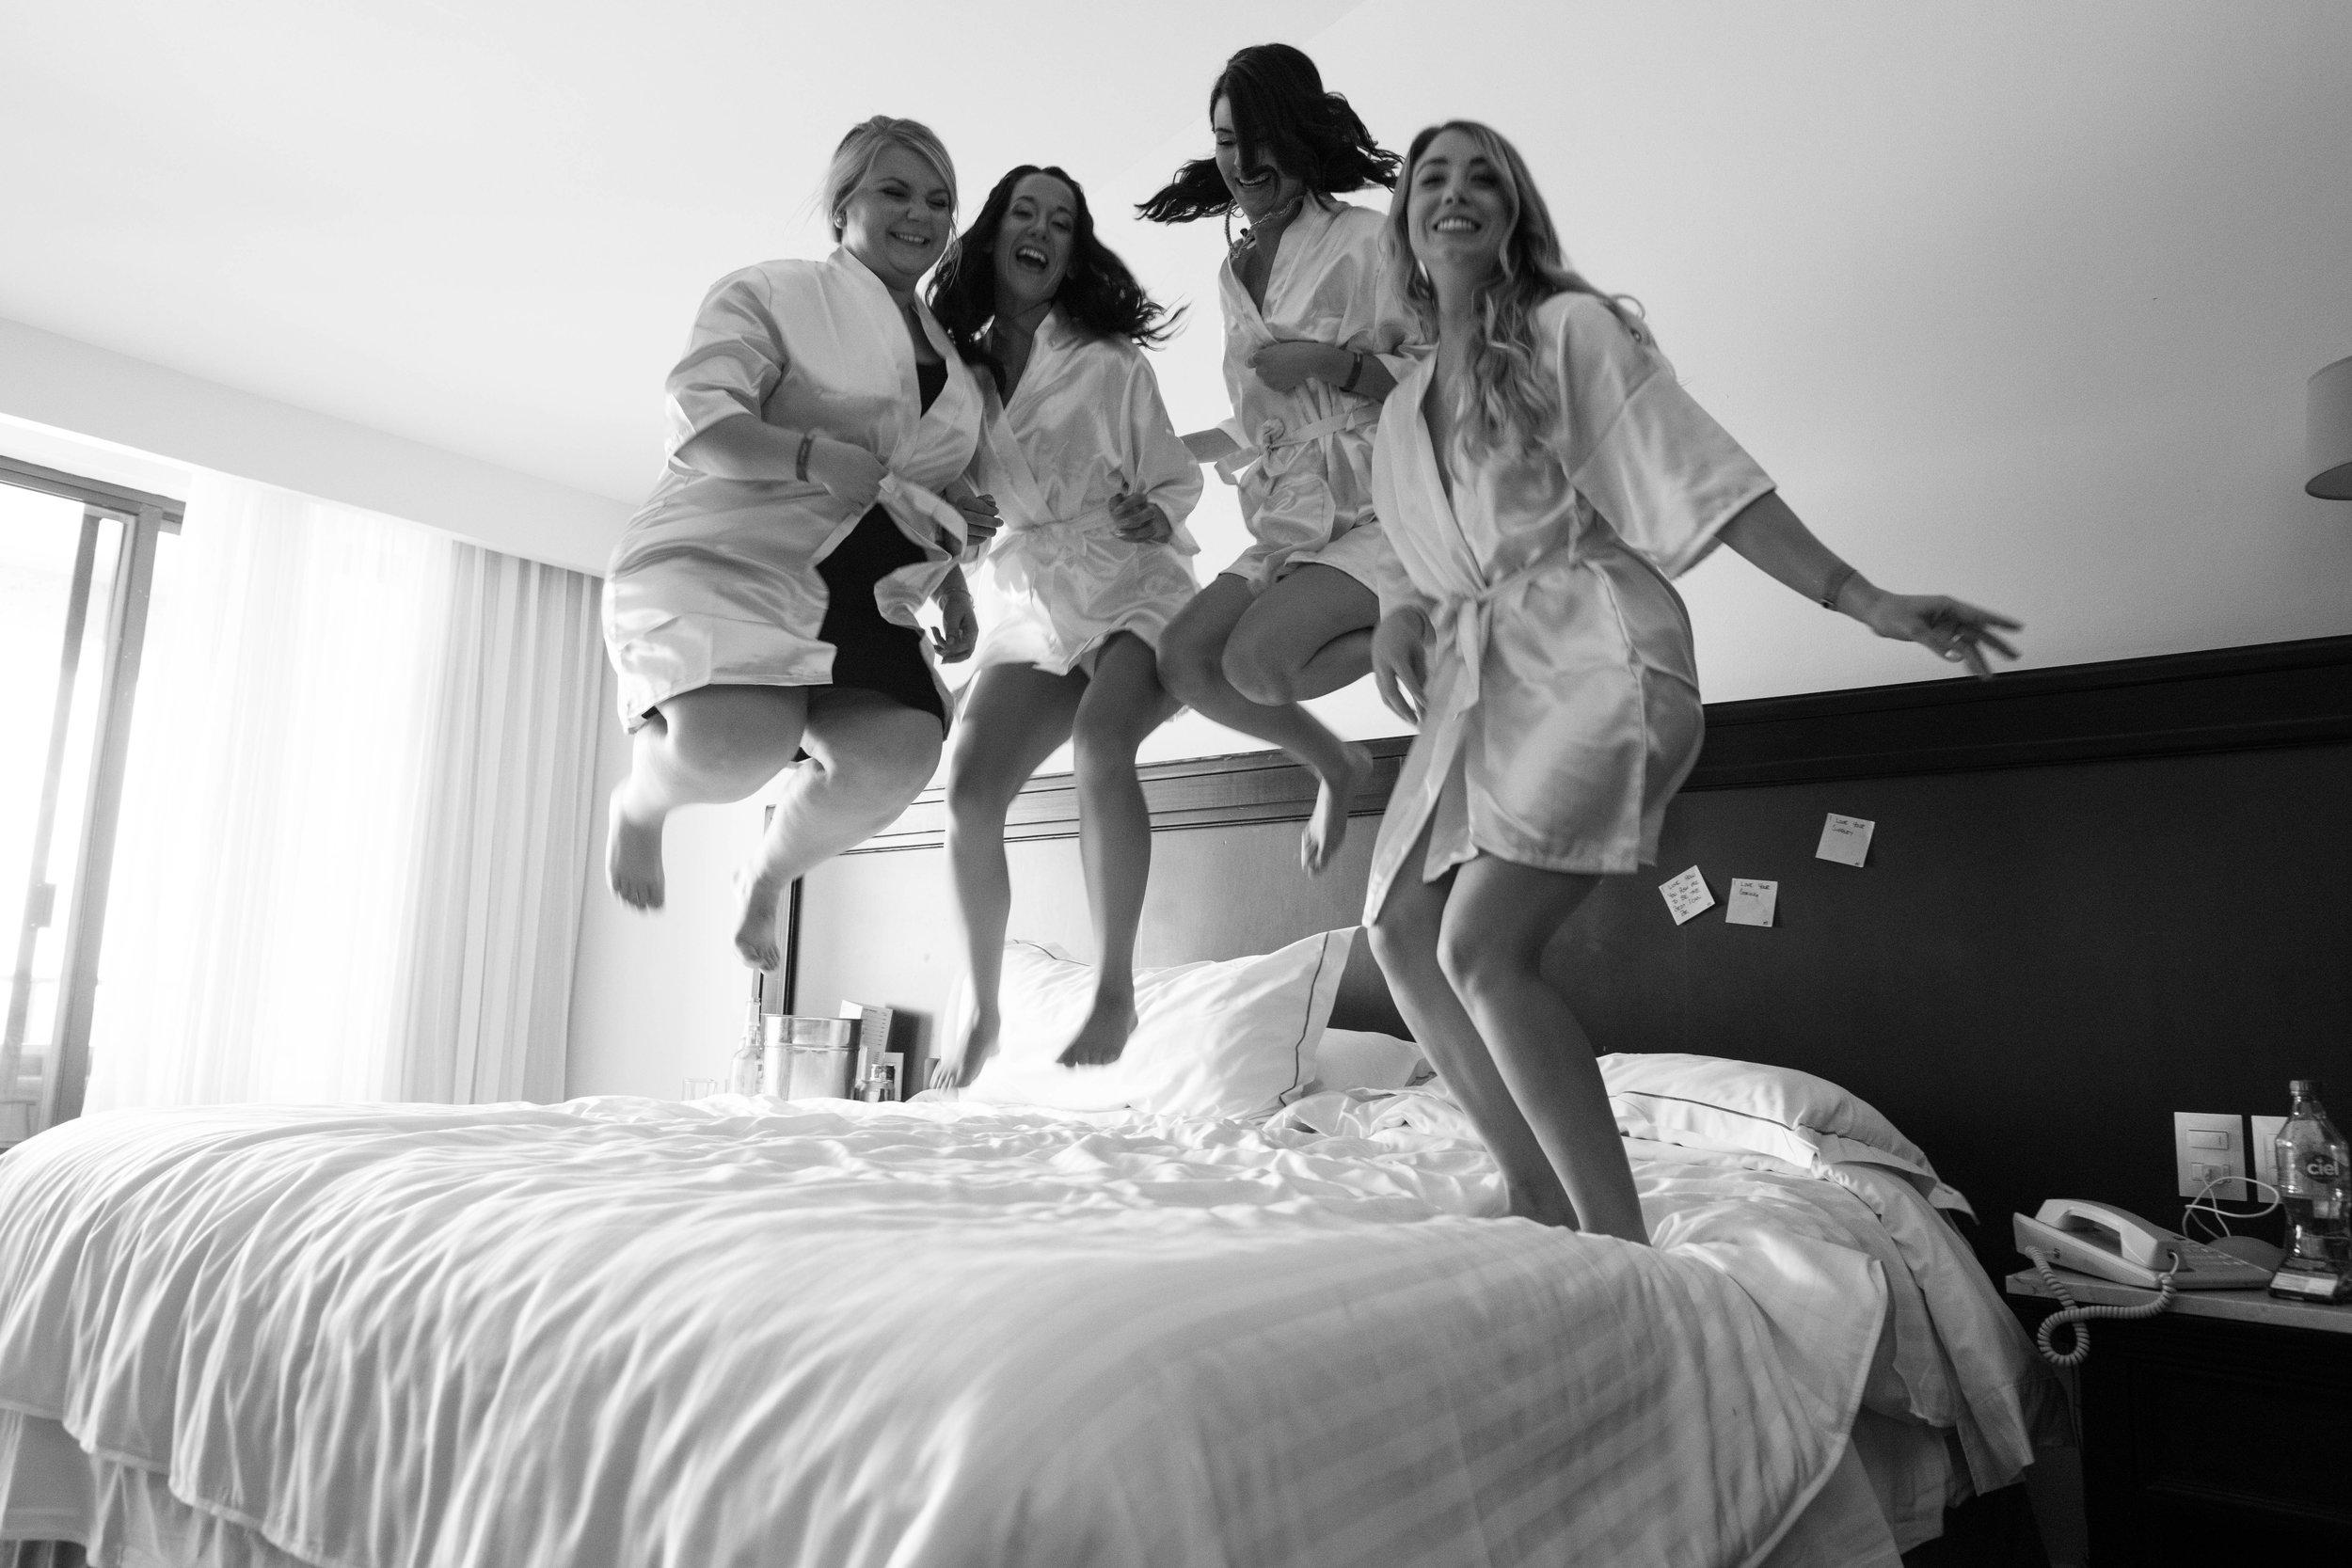 bridesmaids jumping on bed | Huatulco, Mexico